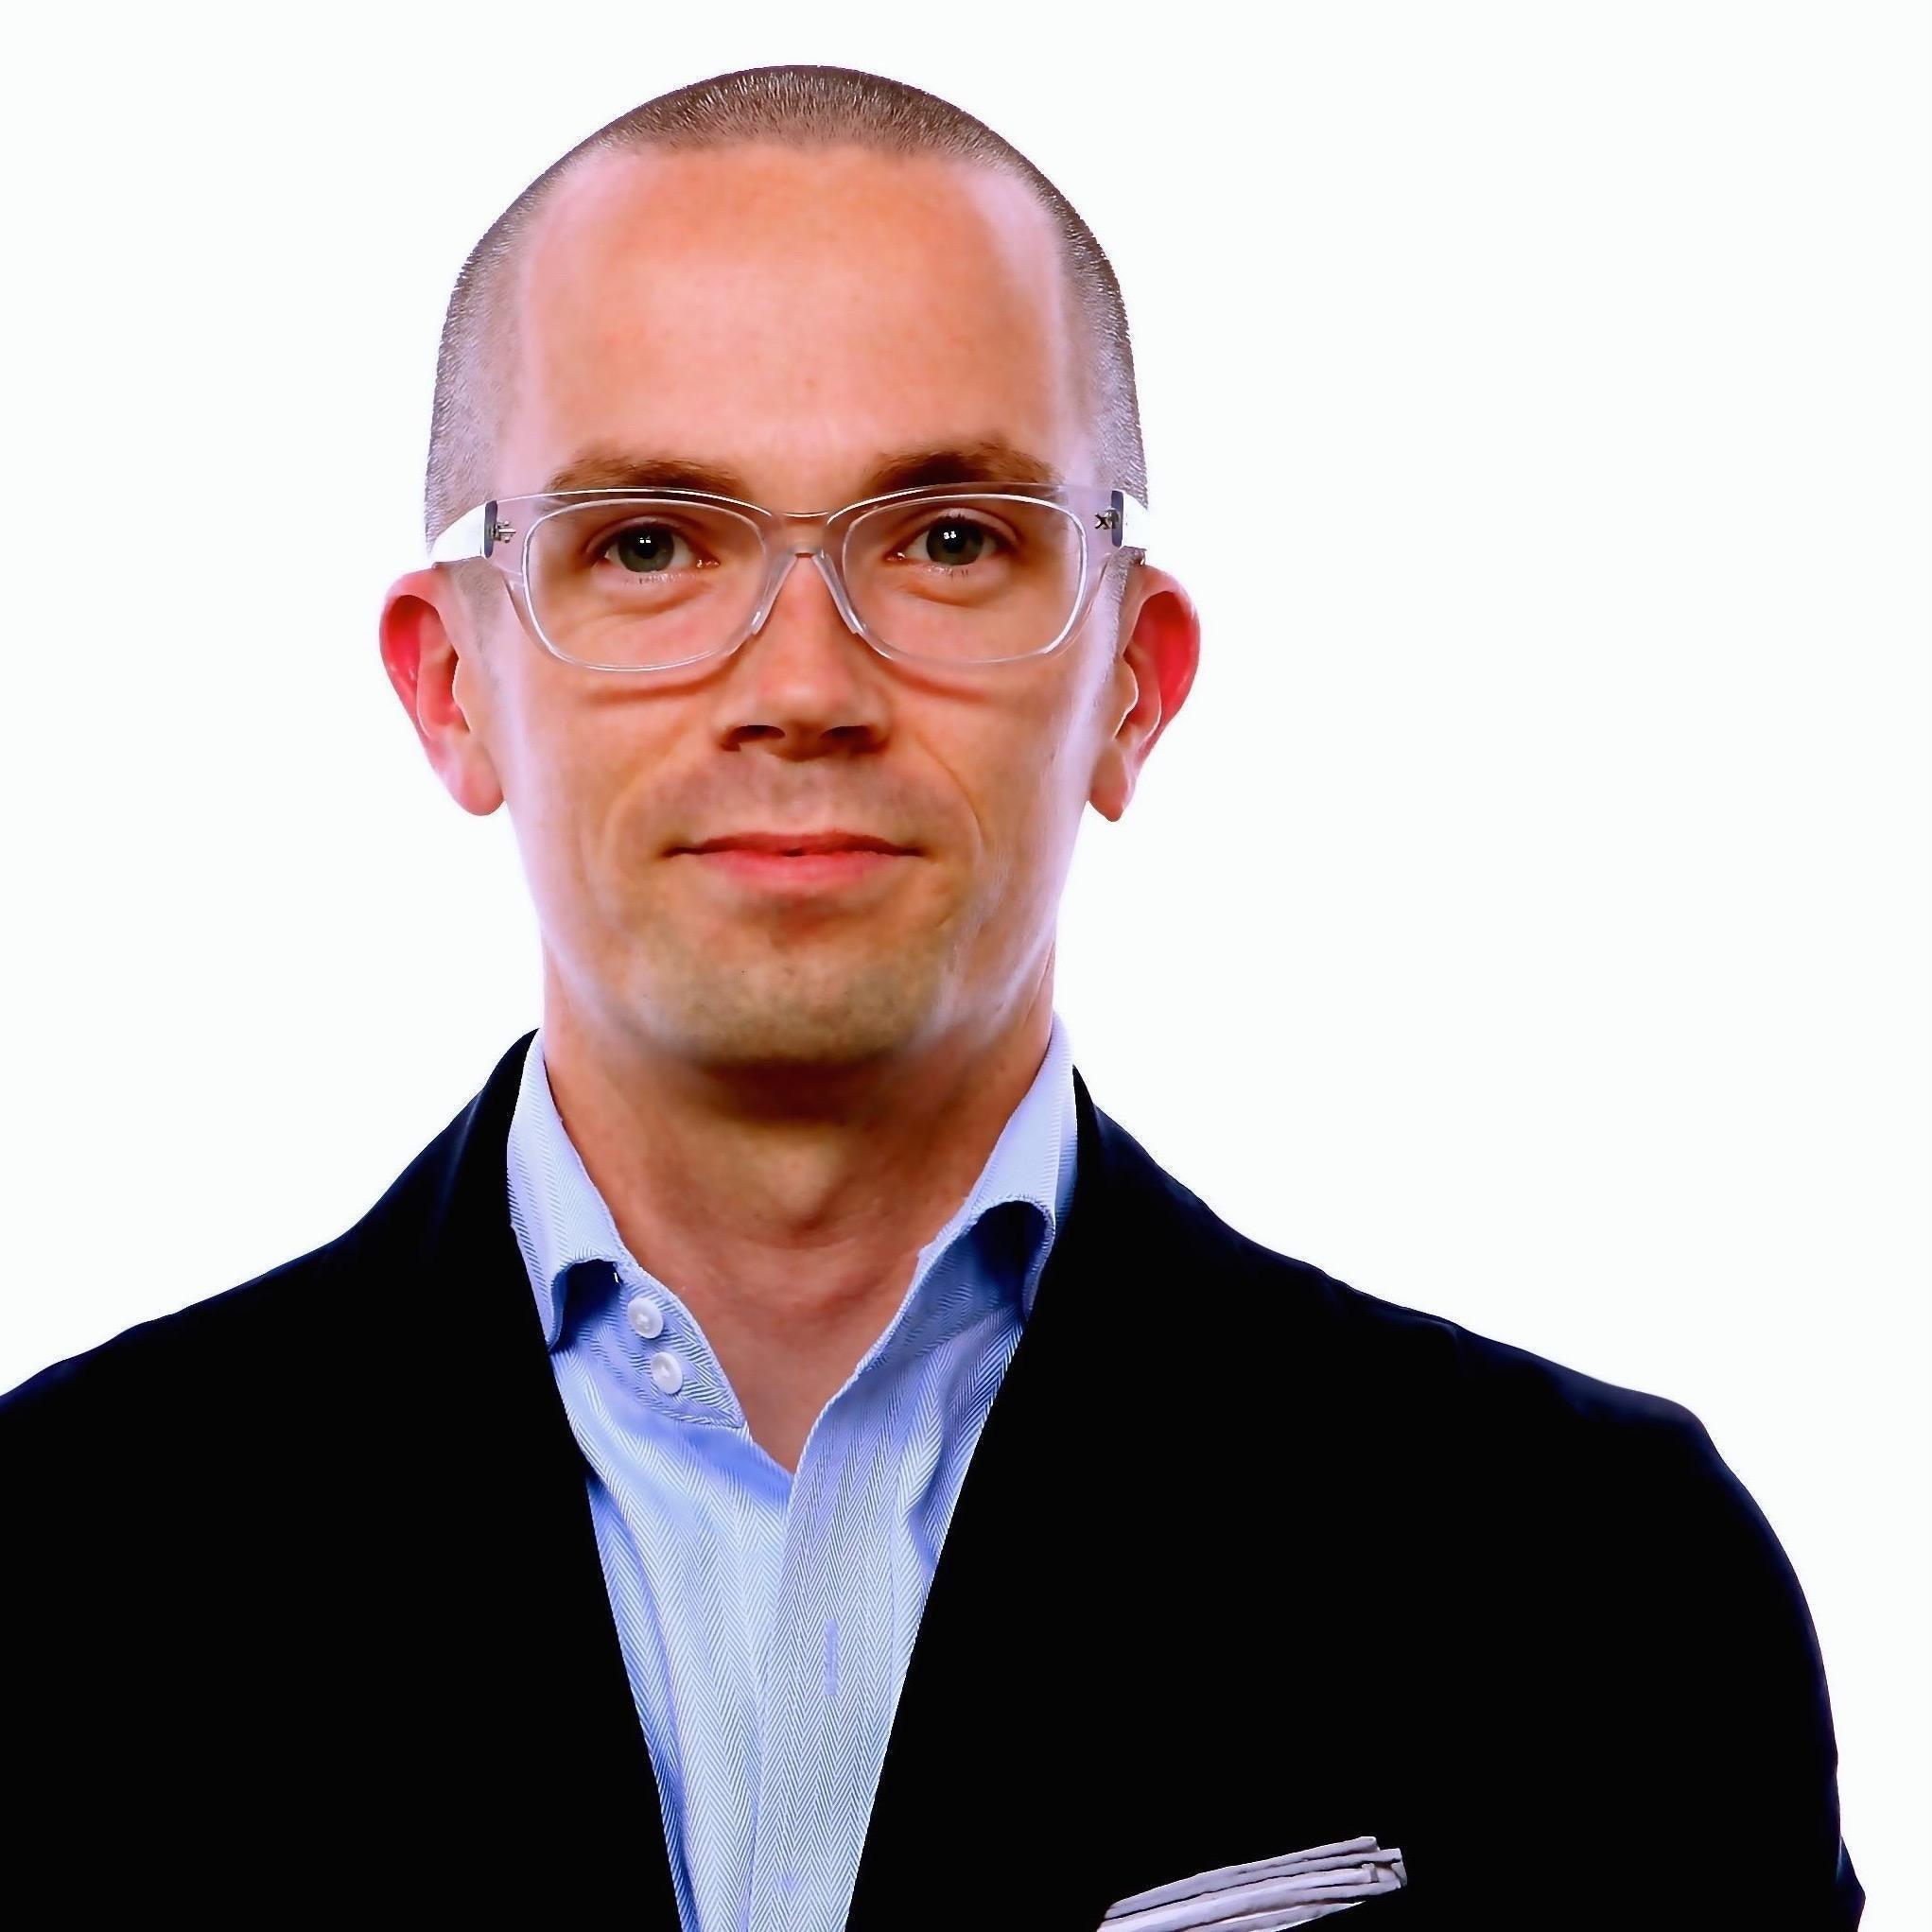 Michael Krueger